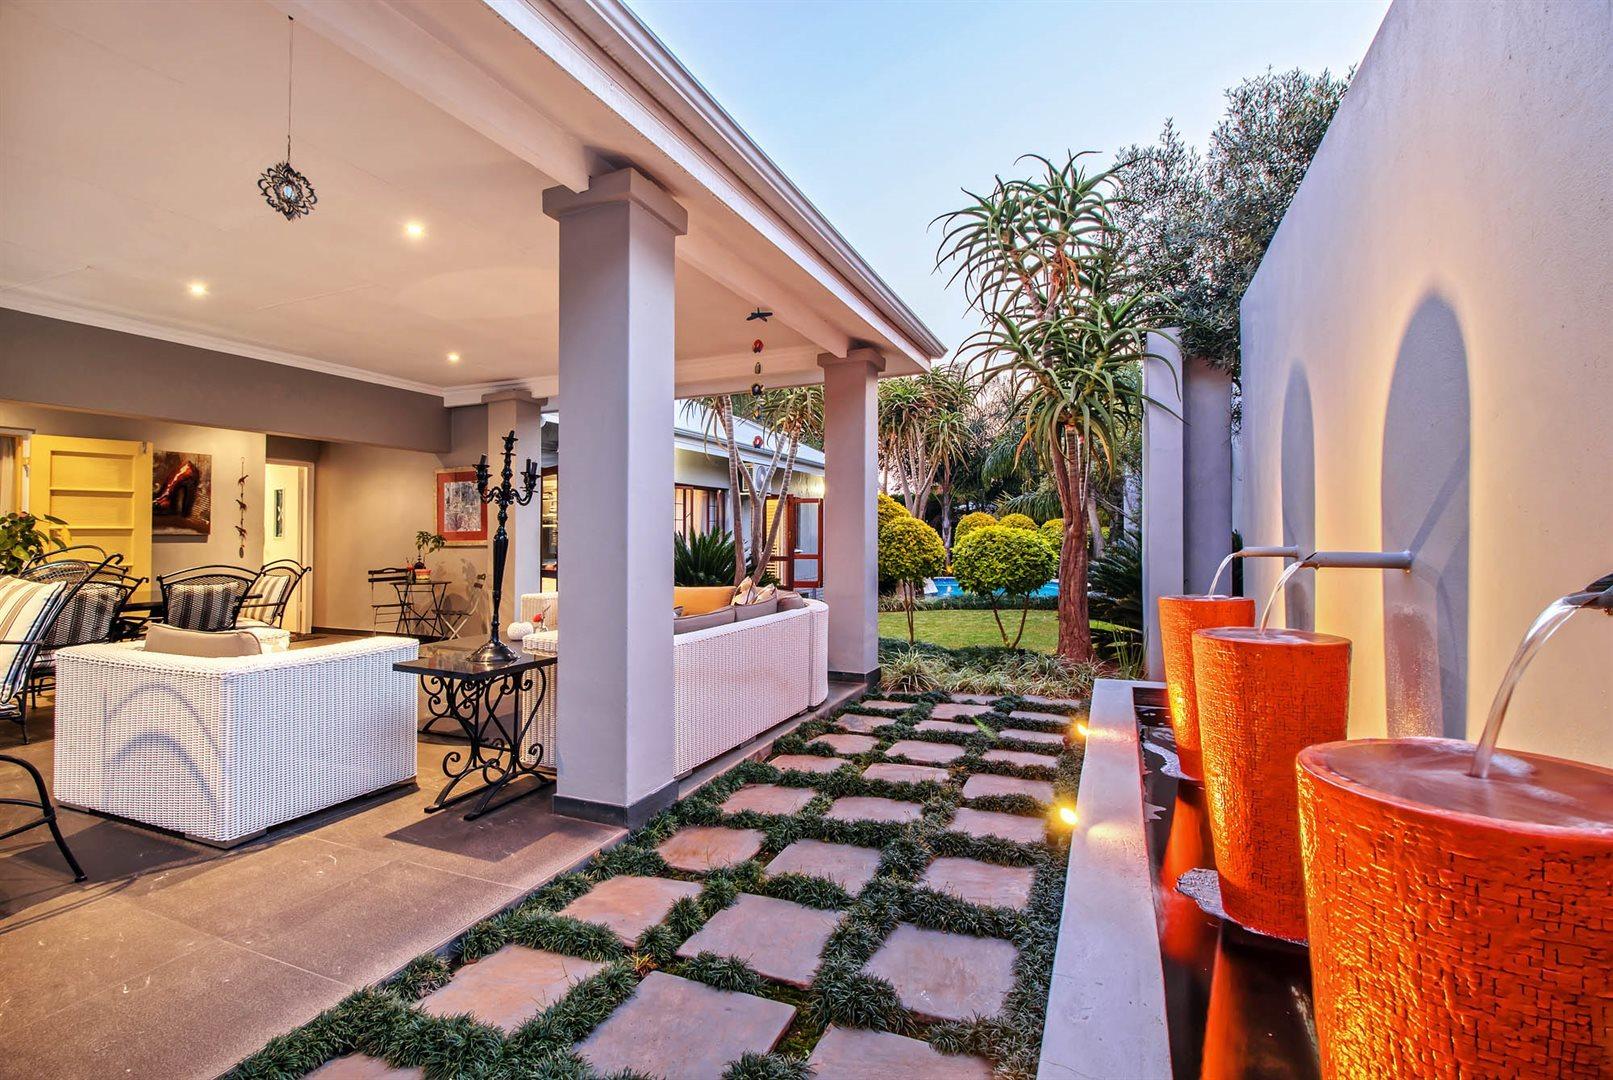 Pretoria, Rietondale Property  | Houses For Sale Rietondale, Rietondale, House 3 bedrooms property for sale Price:3,200,000